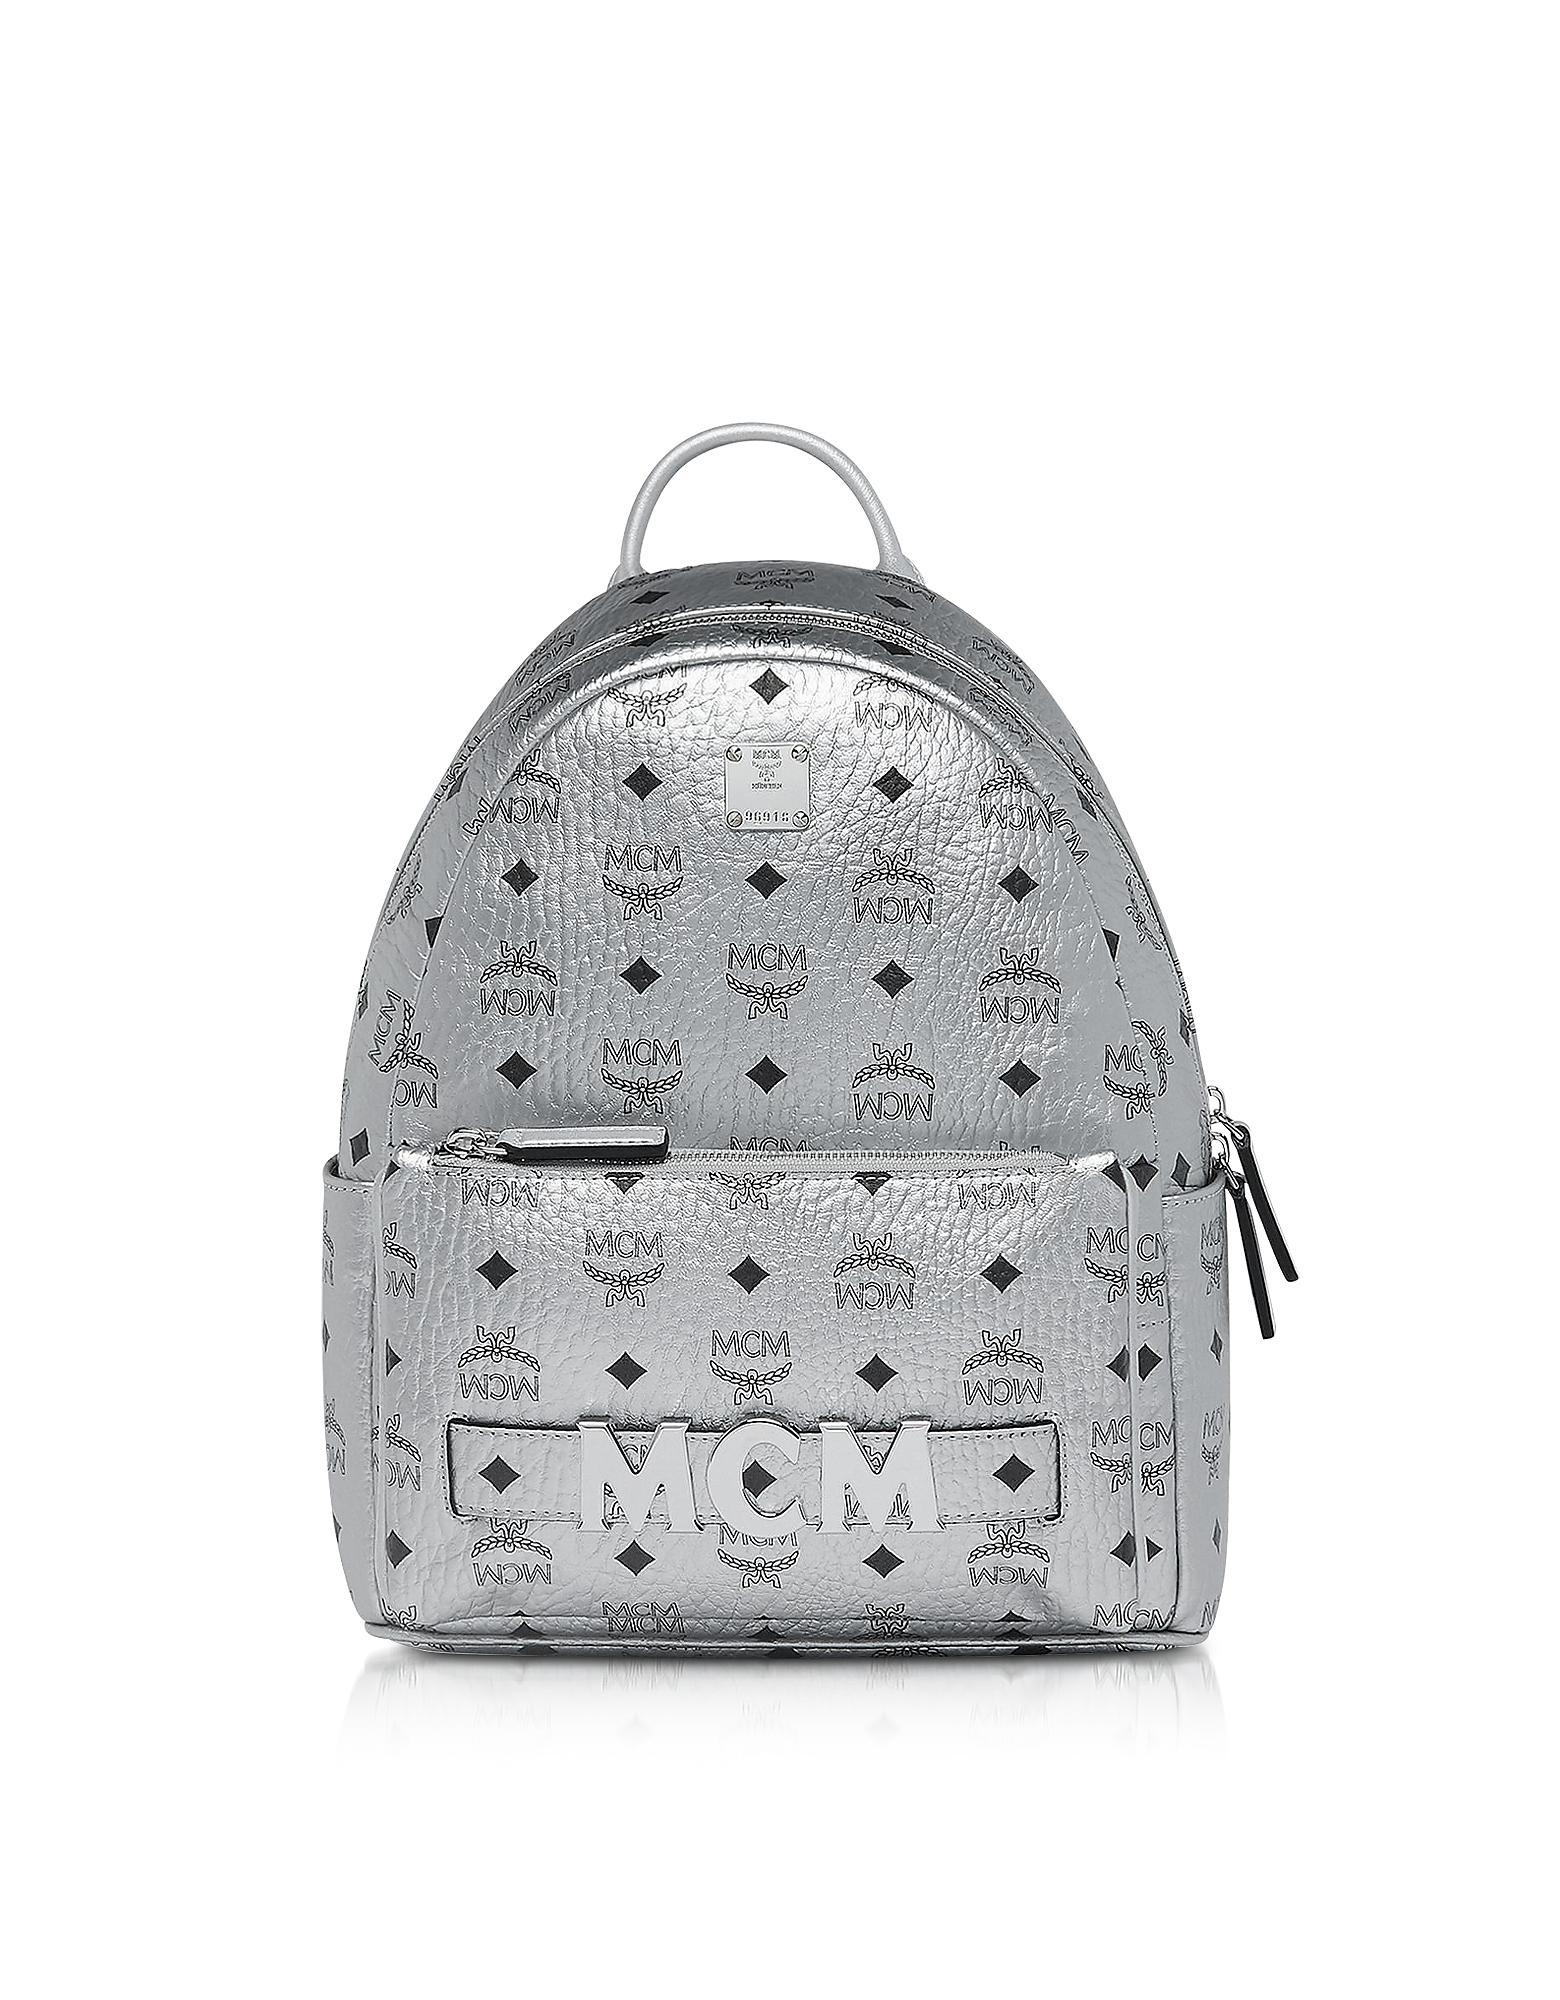 05e29f6586efe MCM - Metallic Berlin Silver Visetos Trilogie Stark Backpack for Men -  Lyst. View fullscreen